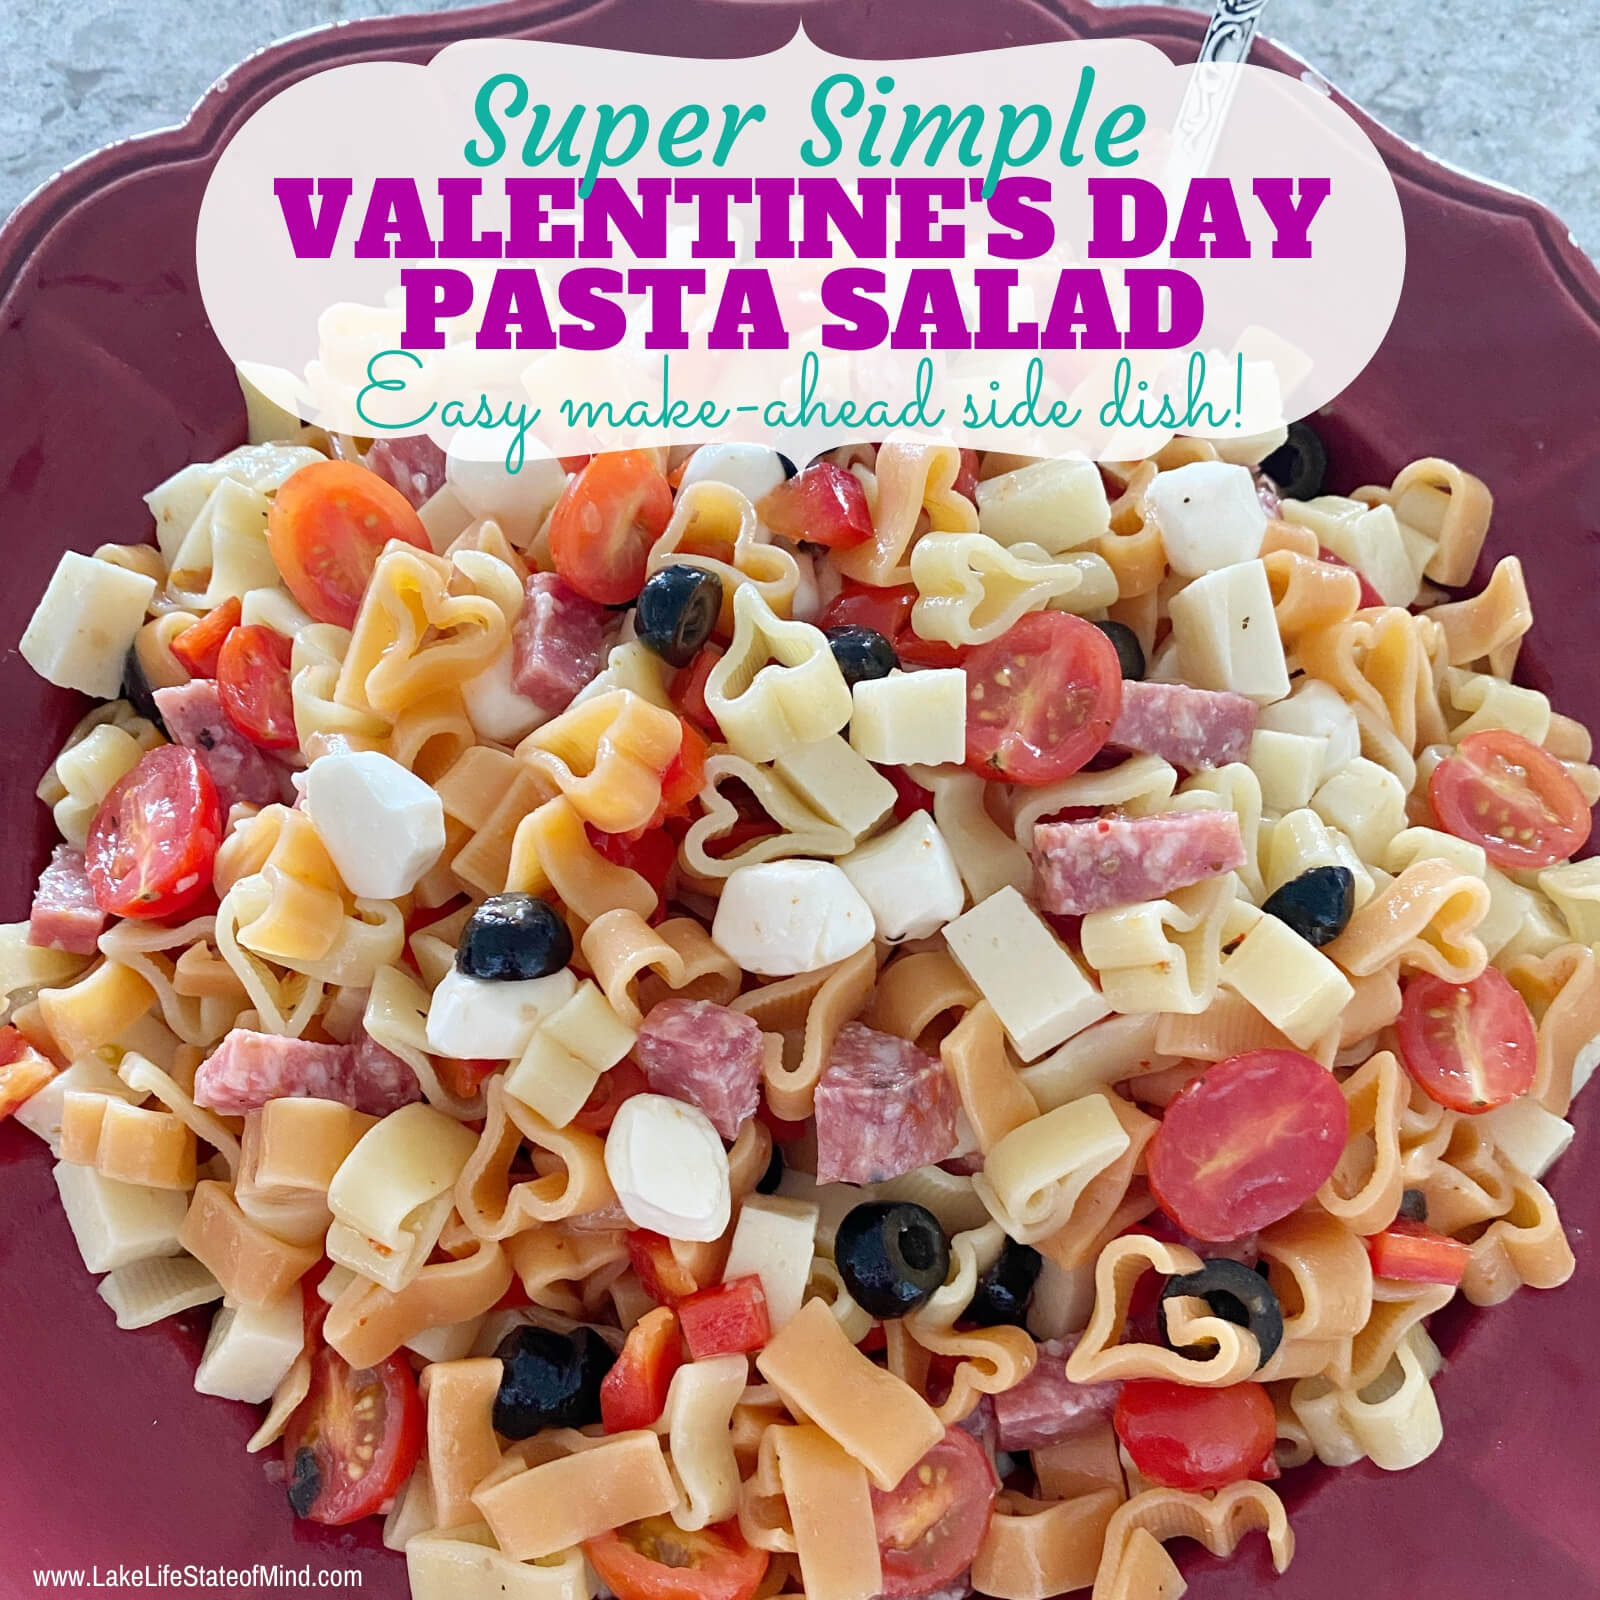 Easy Valentine's Day Pasta Salad